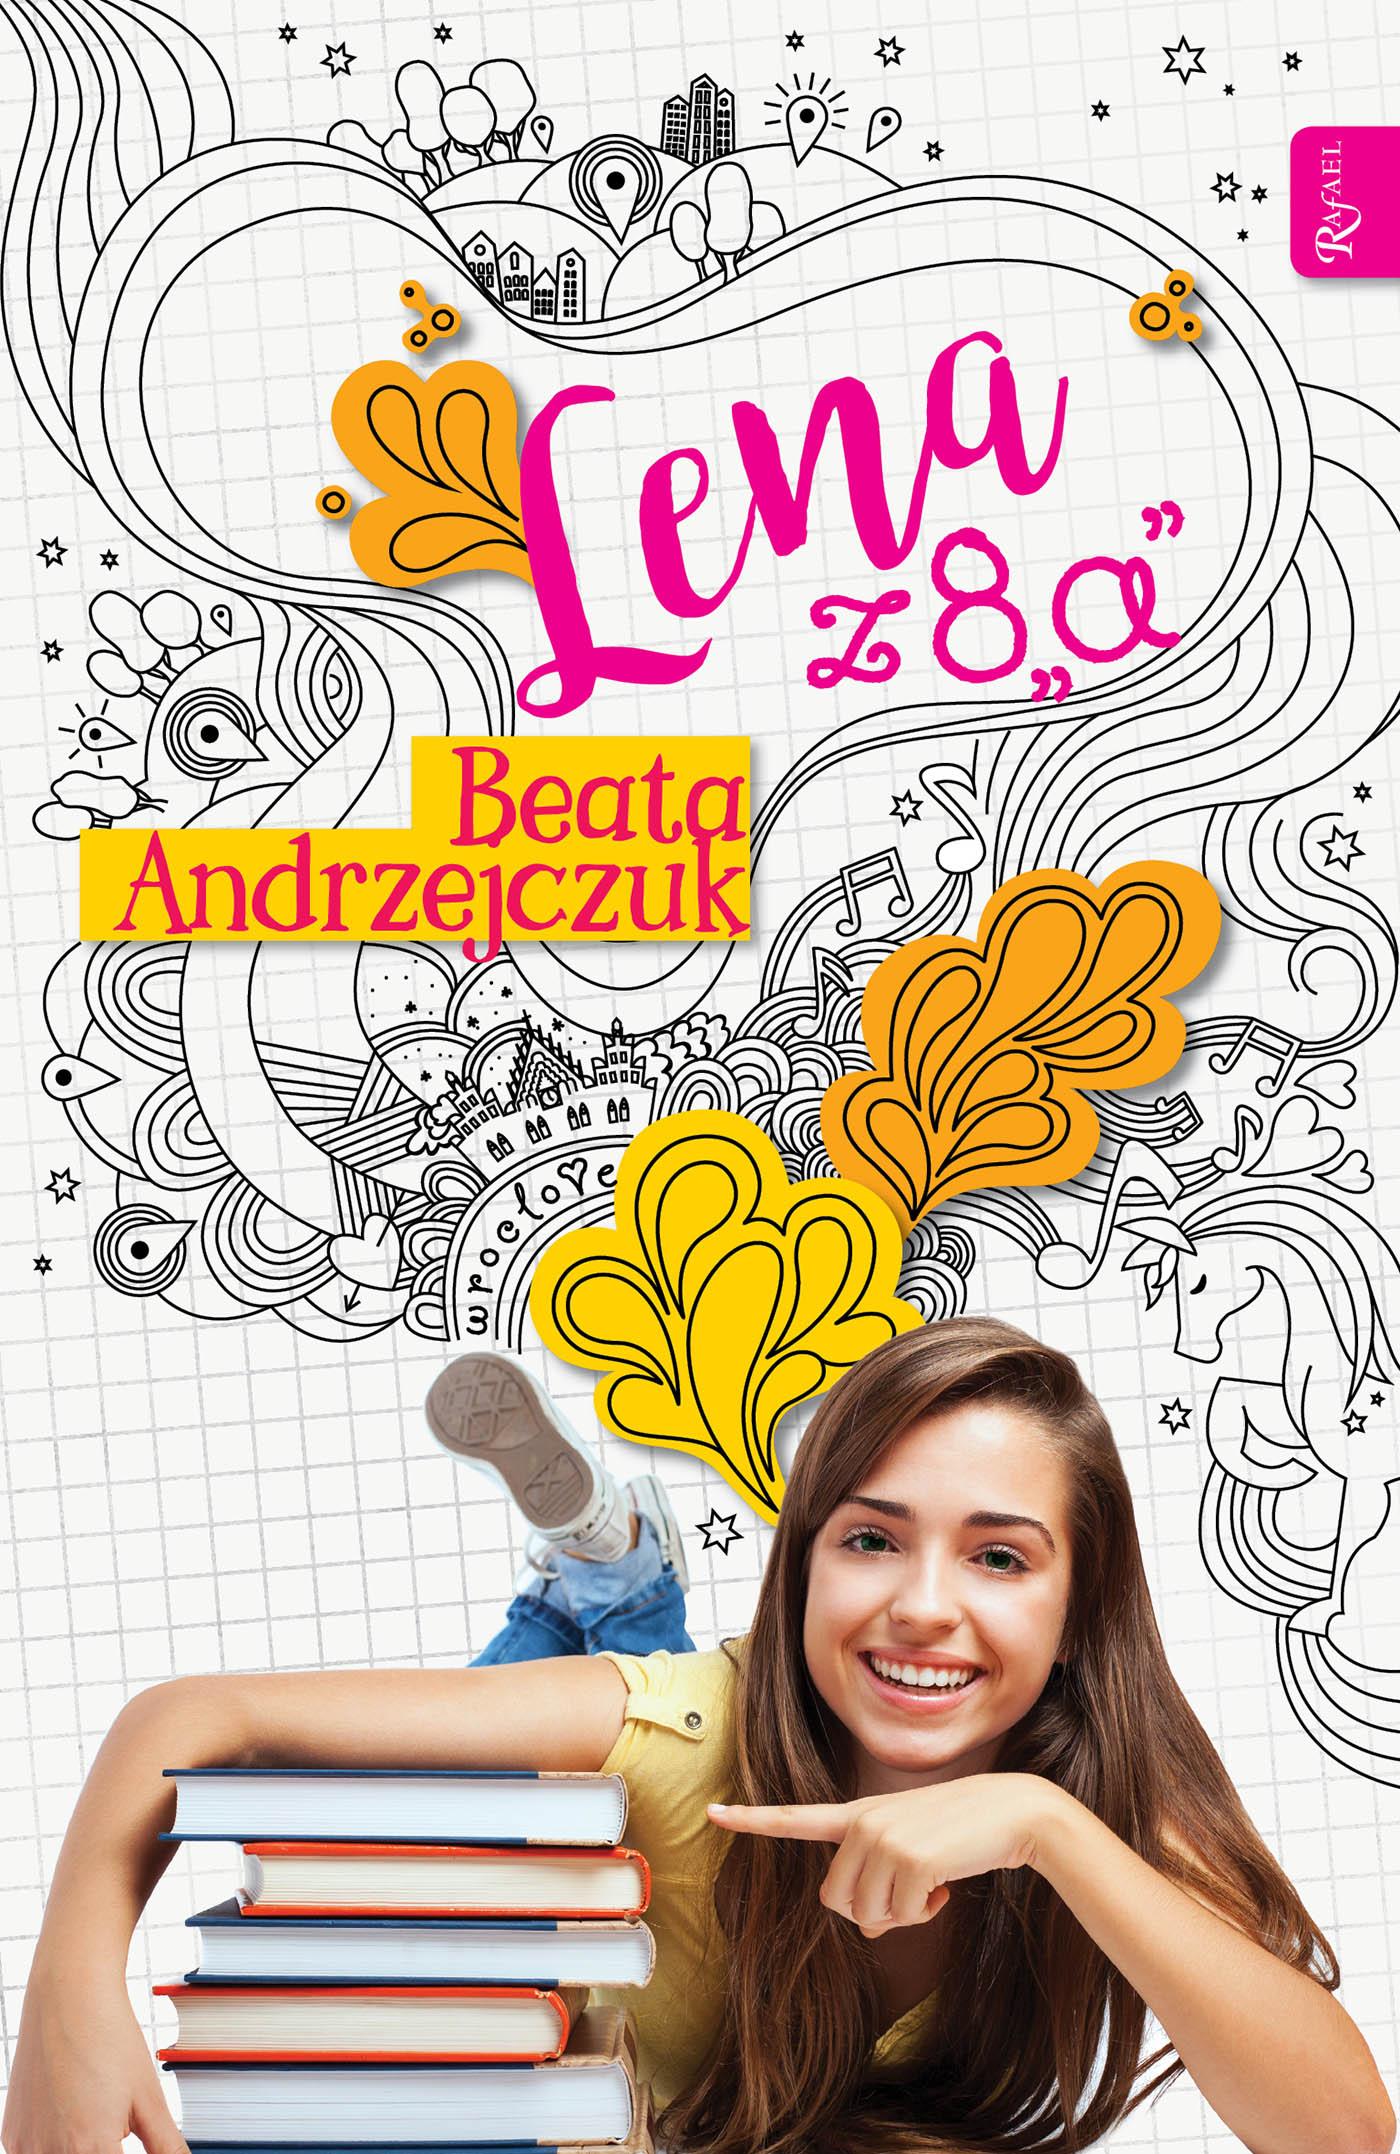 Beata Andrzejczuk Lena